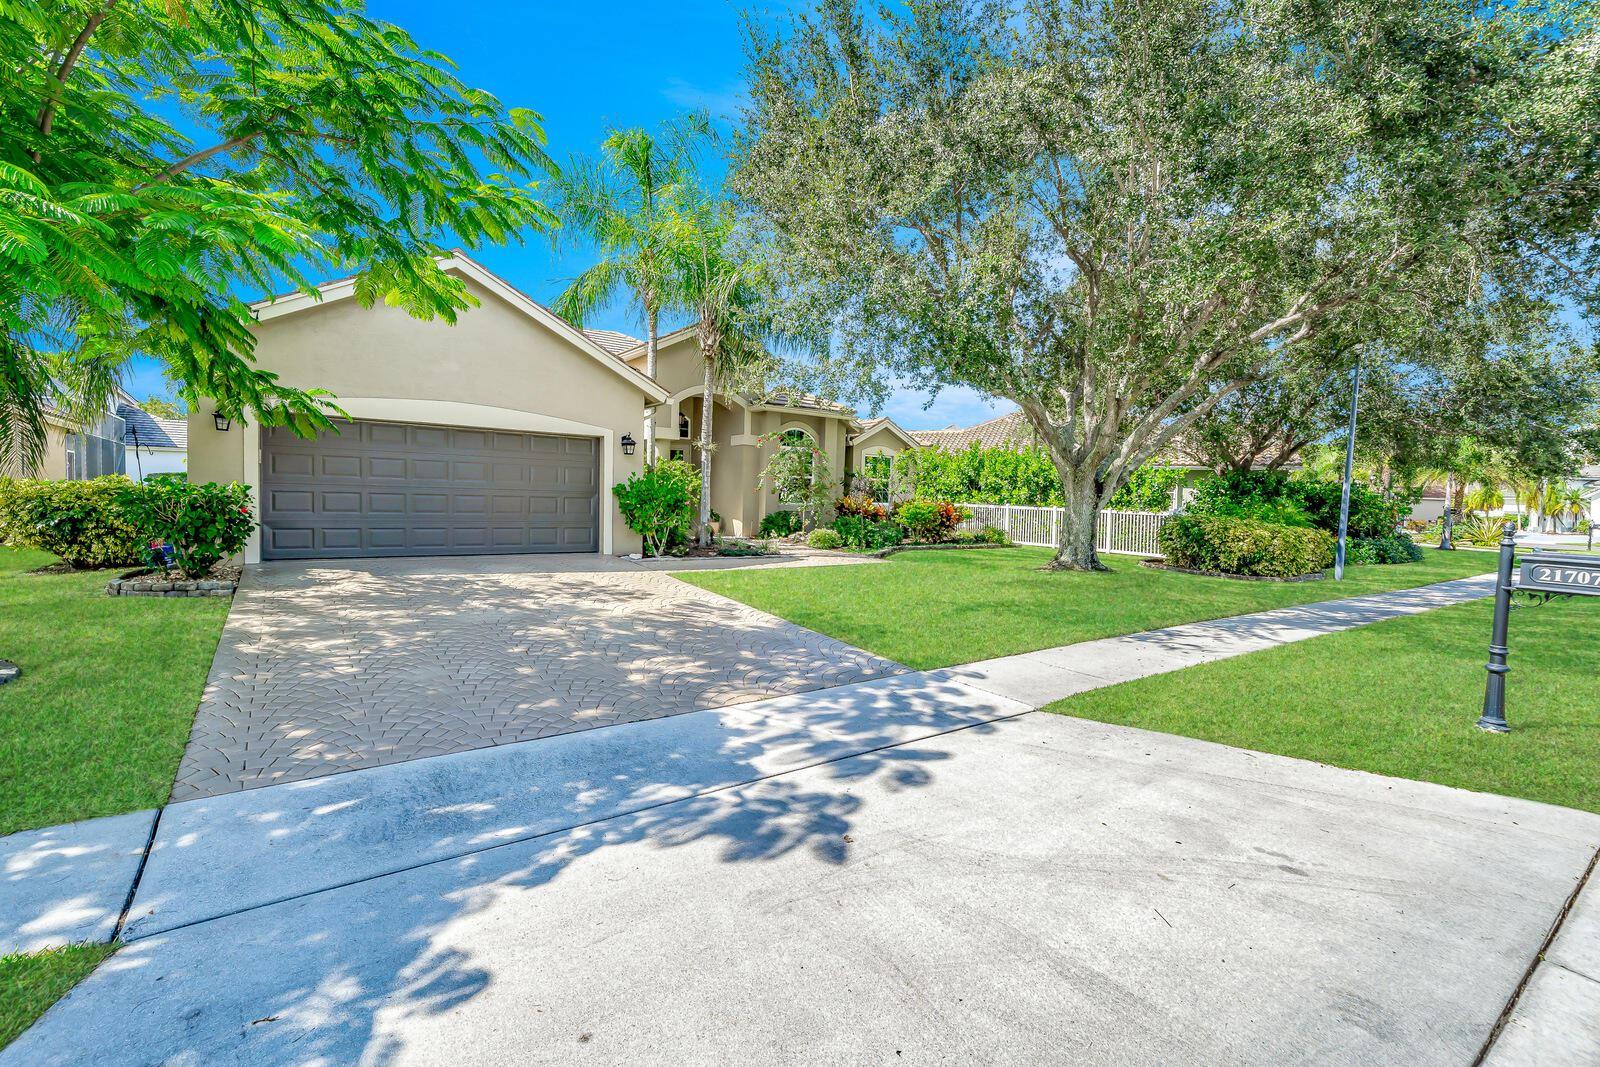 Photo of 21707 Abington Court, Boca Raton, FL 33428 (MLS # RX-10752486)